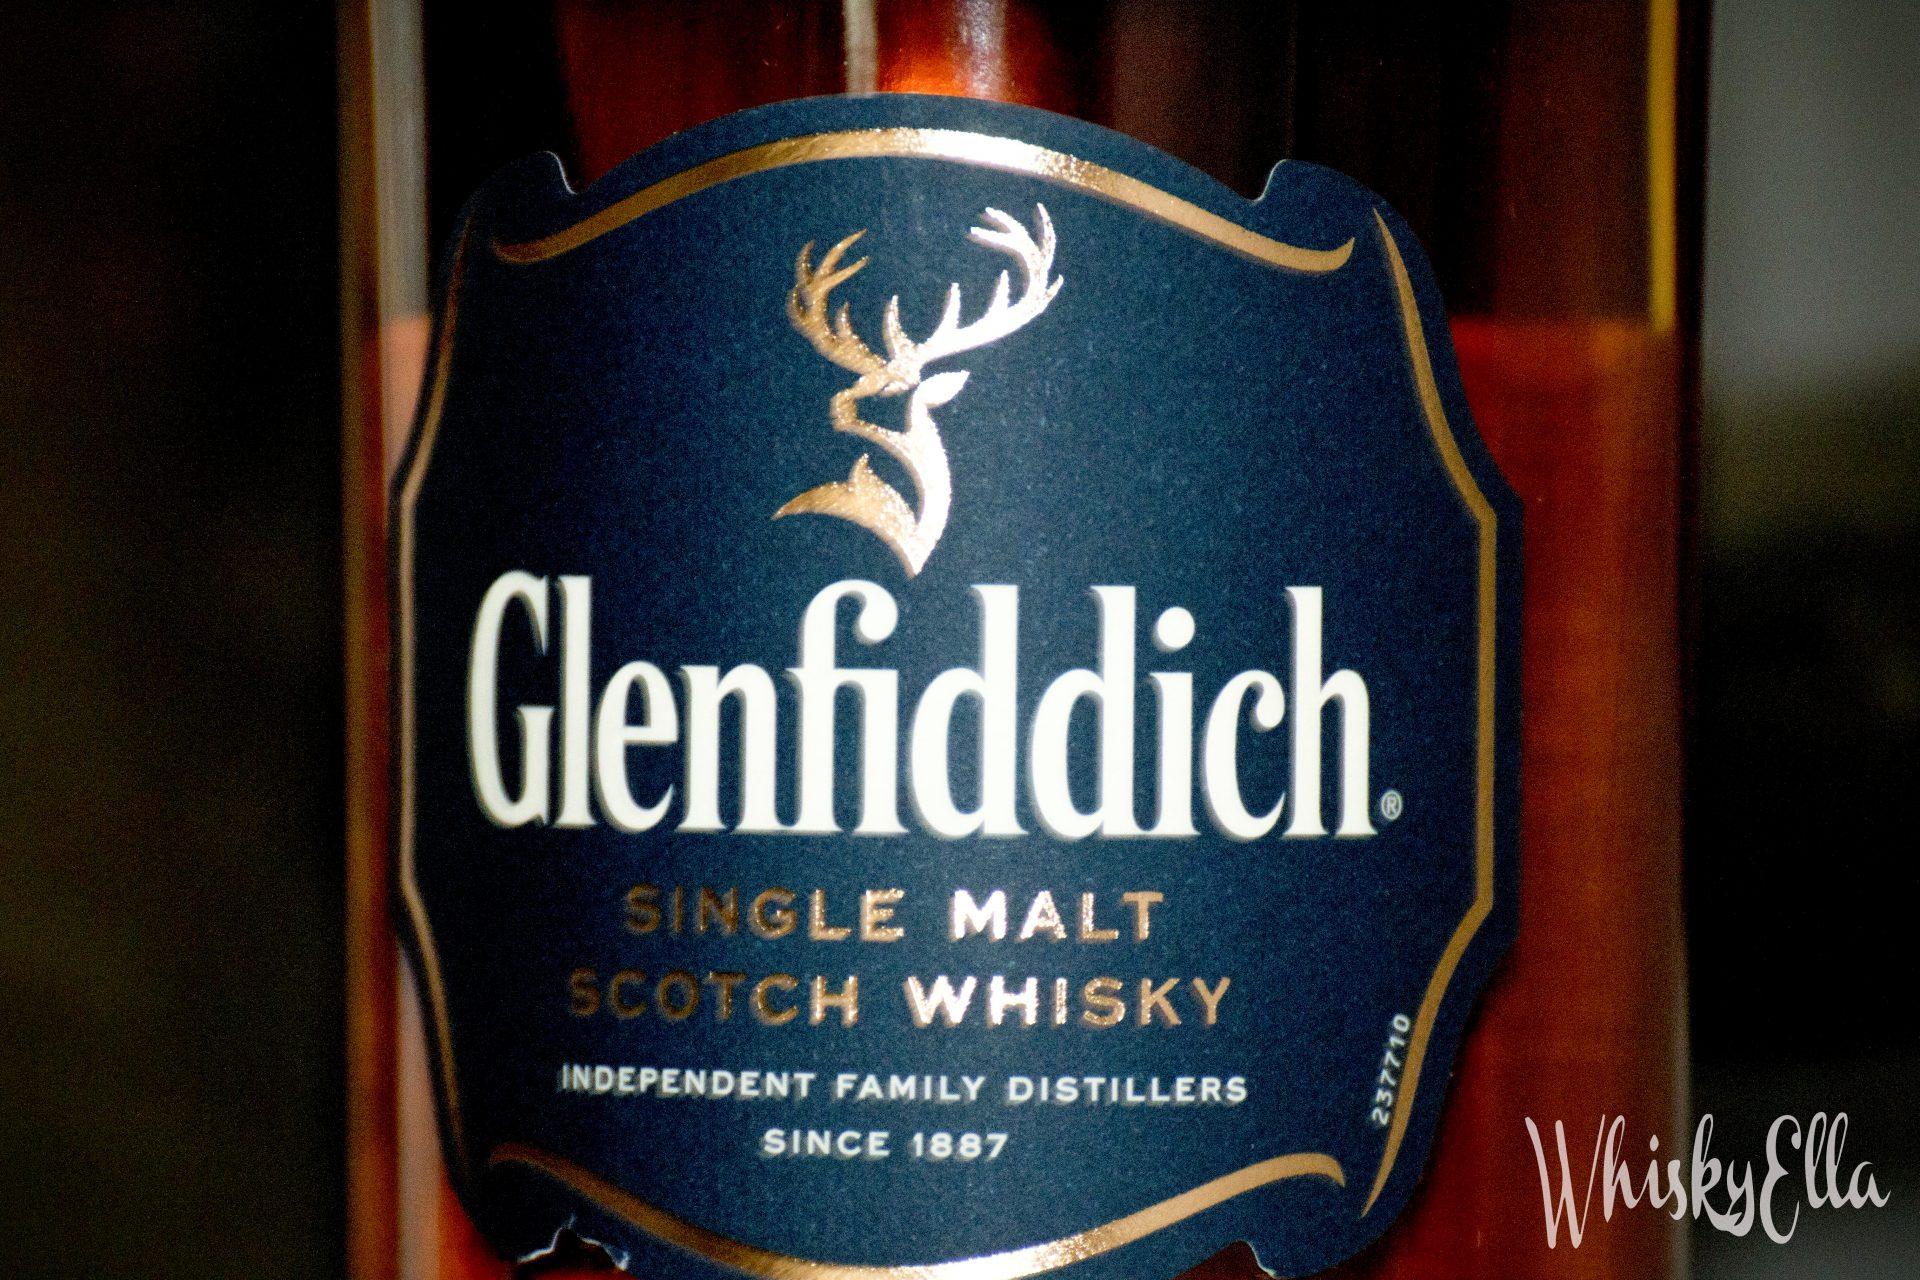 Nasza recenzja Glenfiddich 15 yo Distillery Edition #49